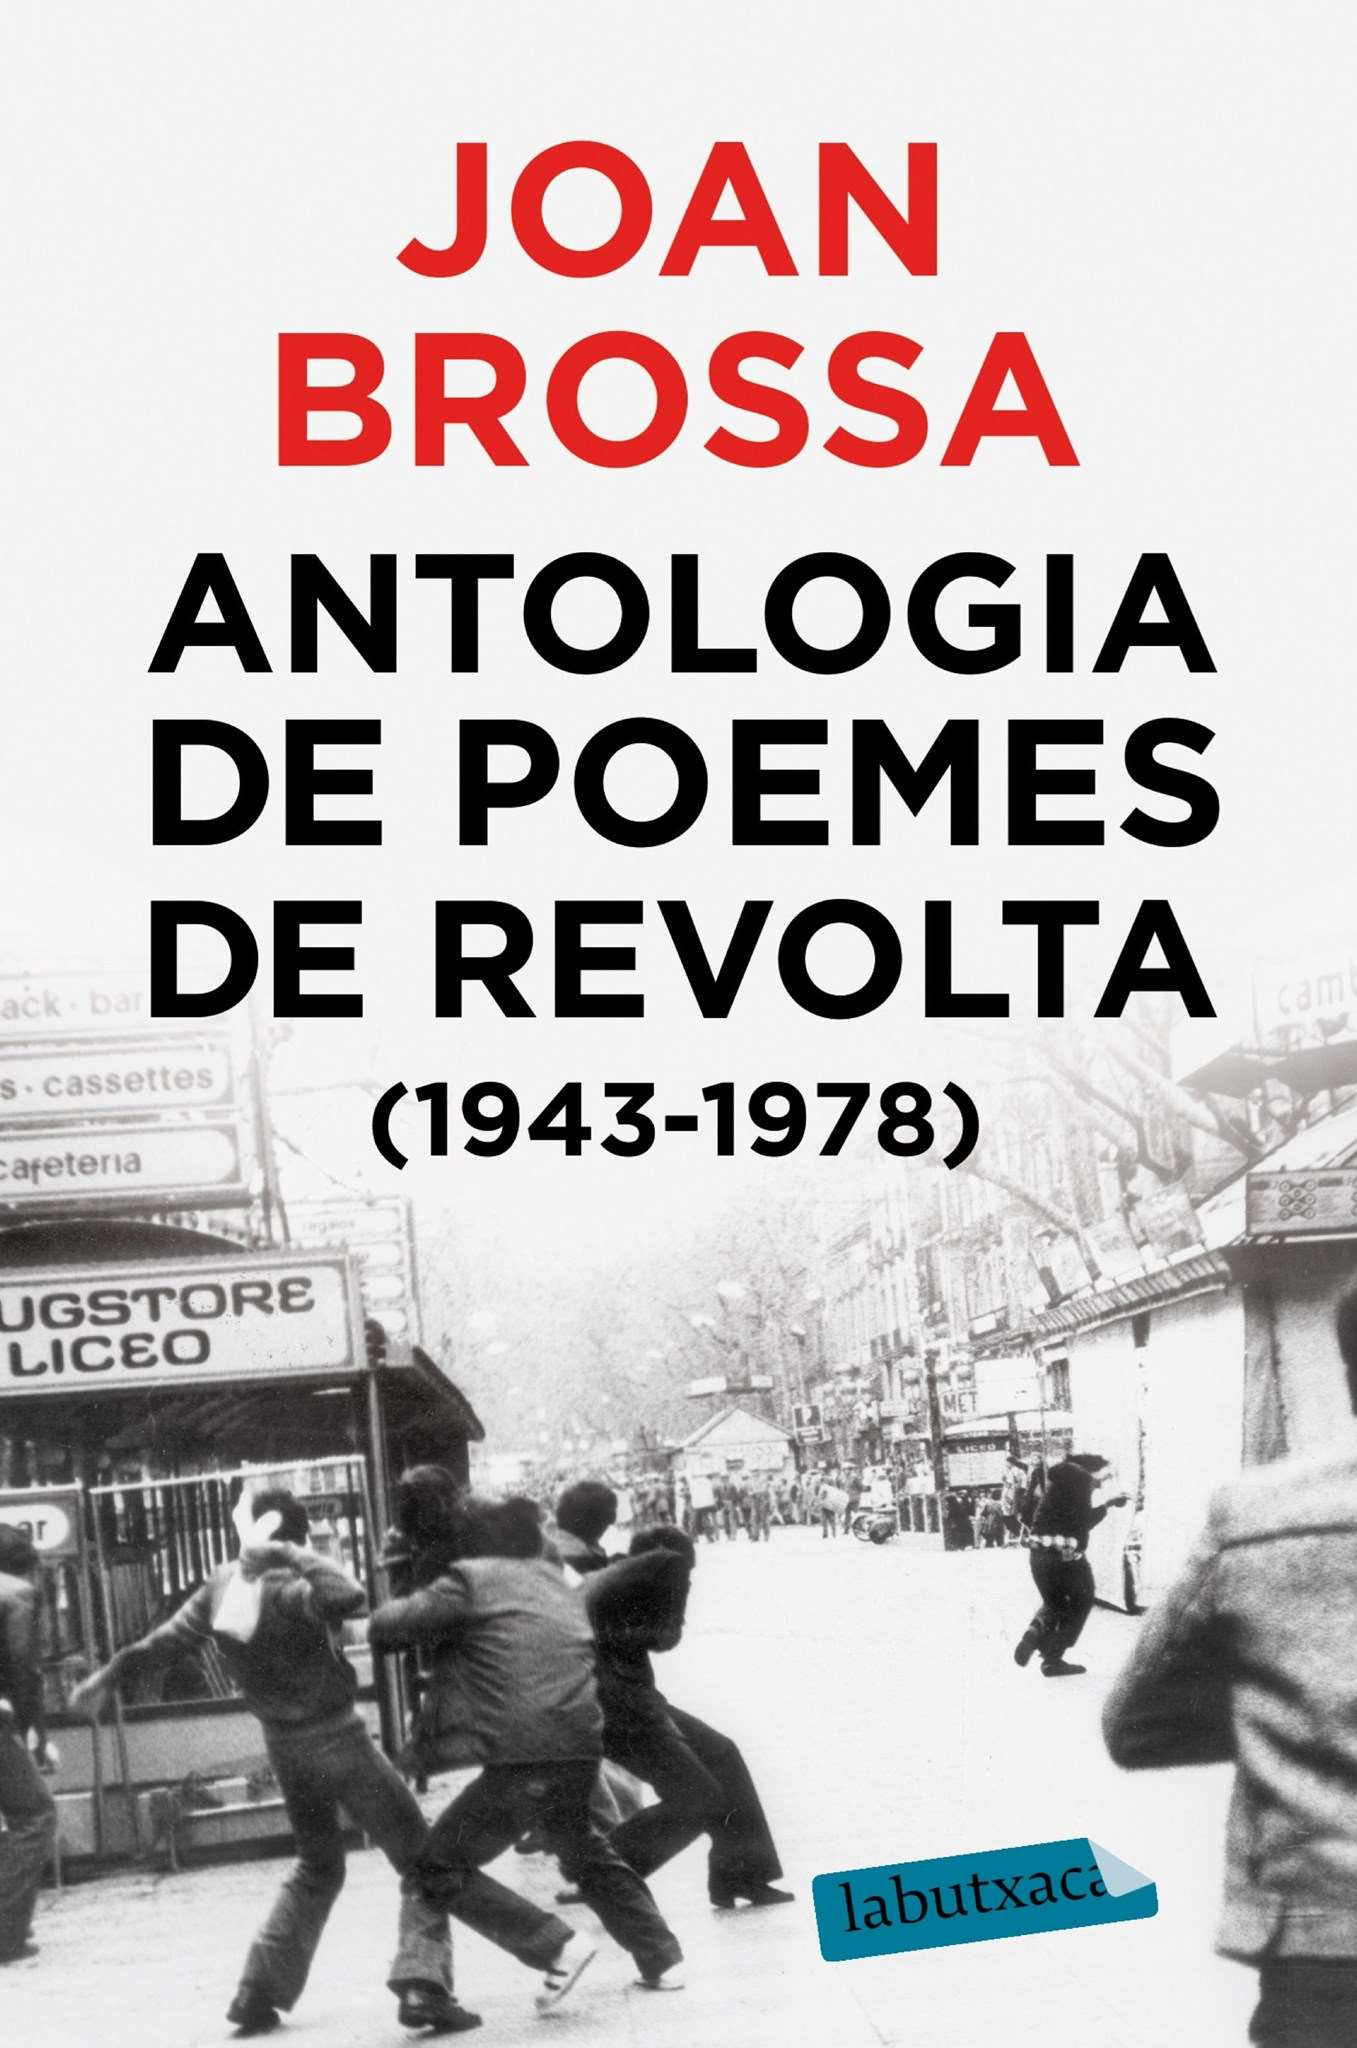 Antologia de poemes revolta